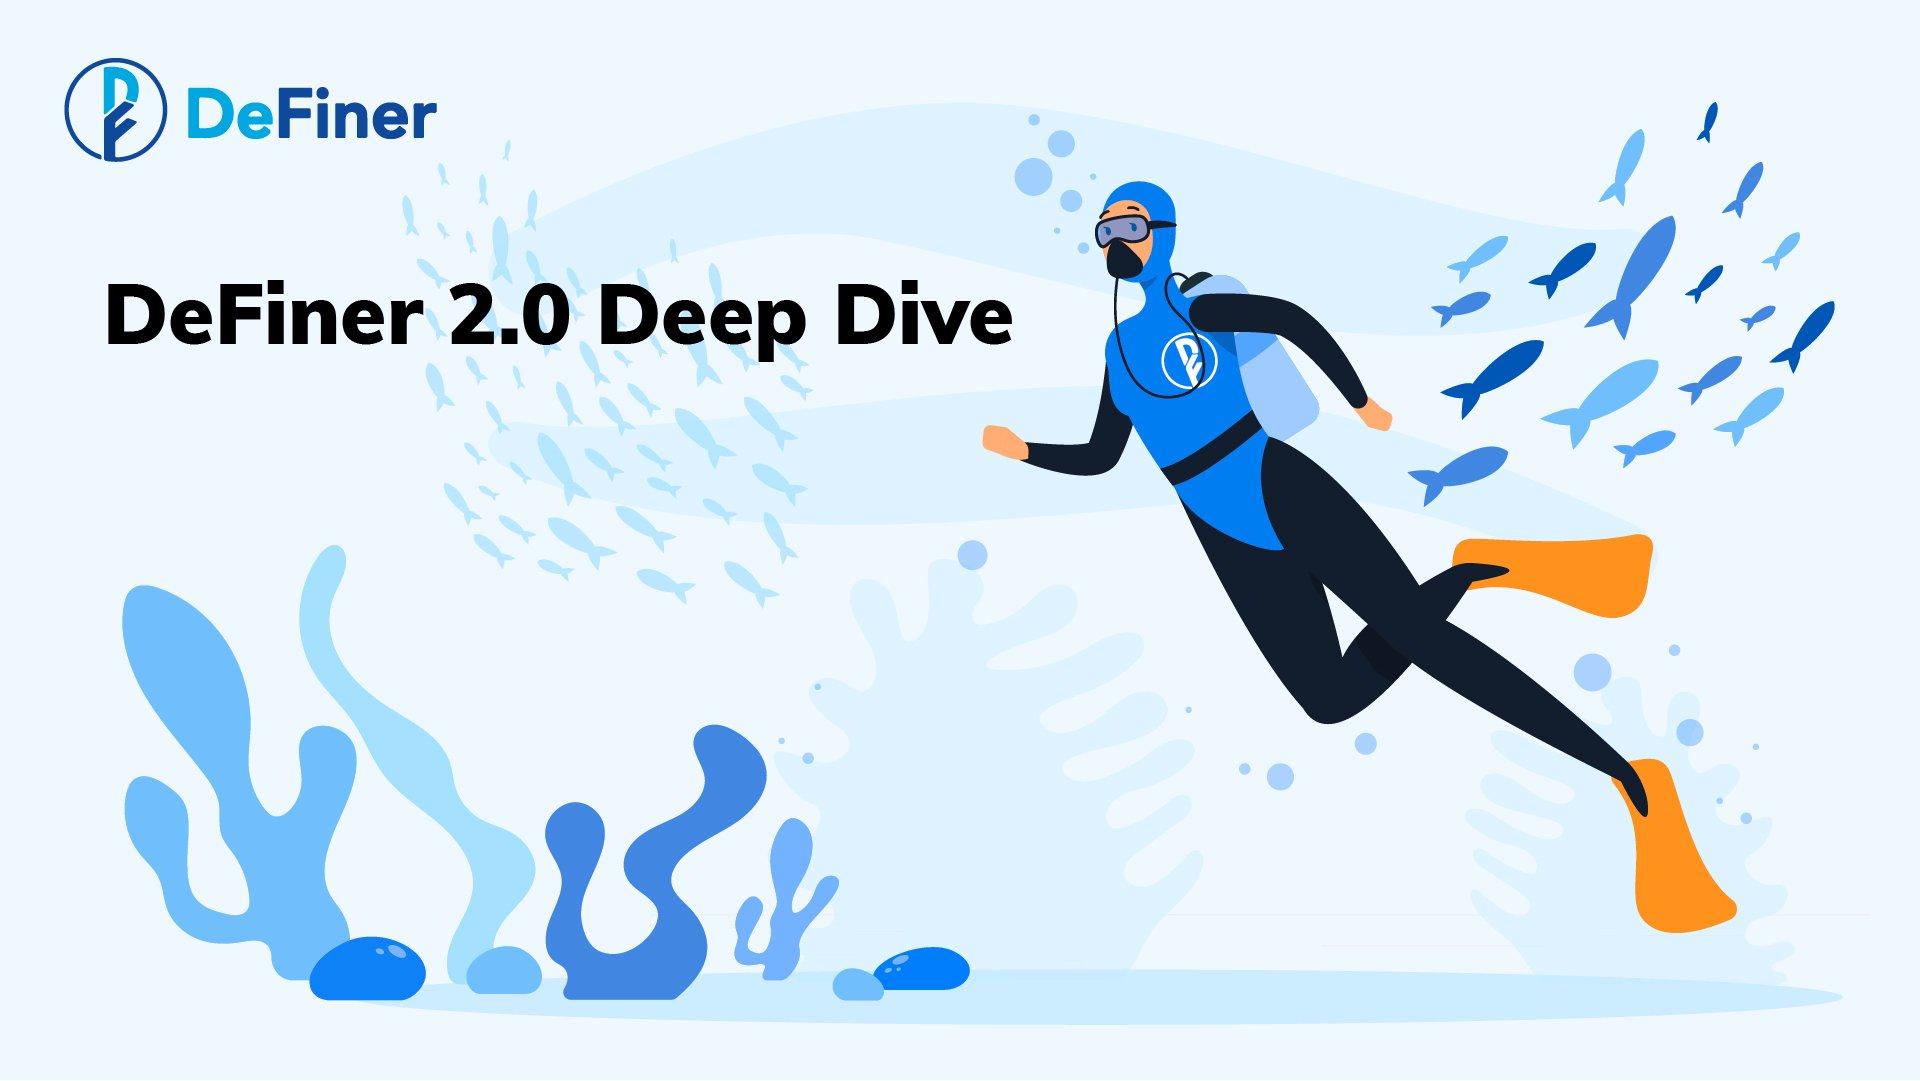 Thumbnail image_DeFiner 2.0 Deep Dive (1)